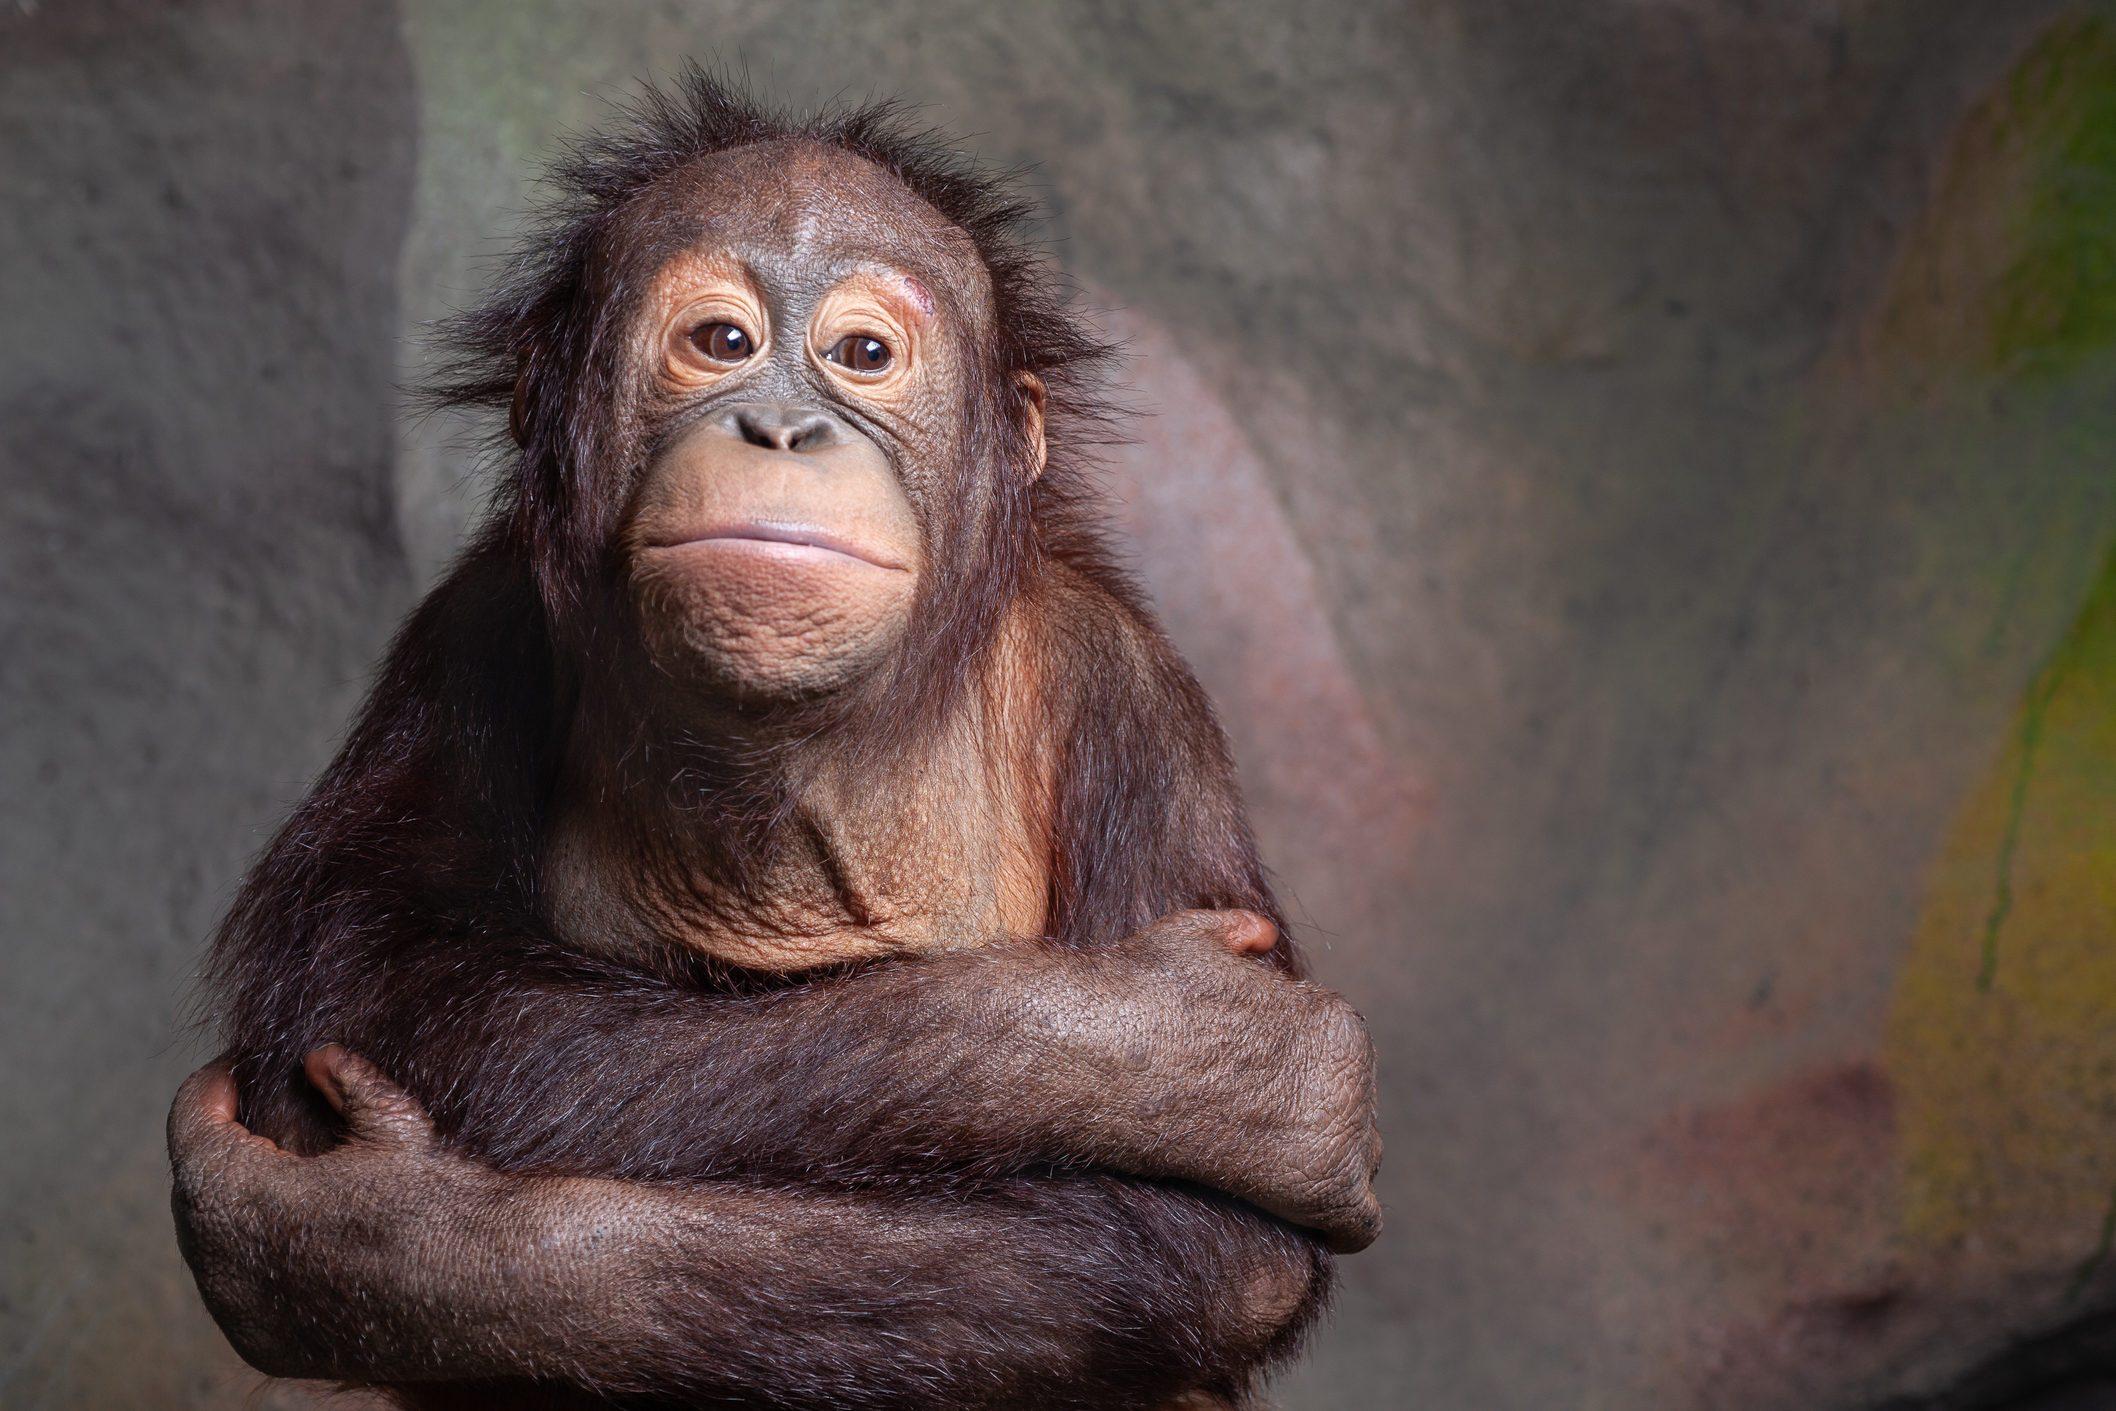 urangutan is endangered in Indonisia